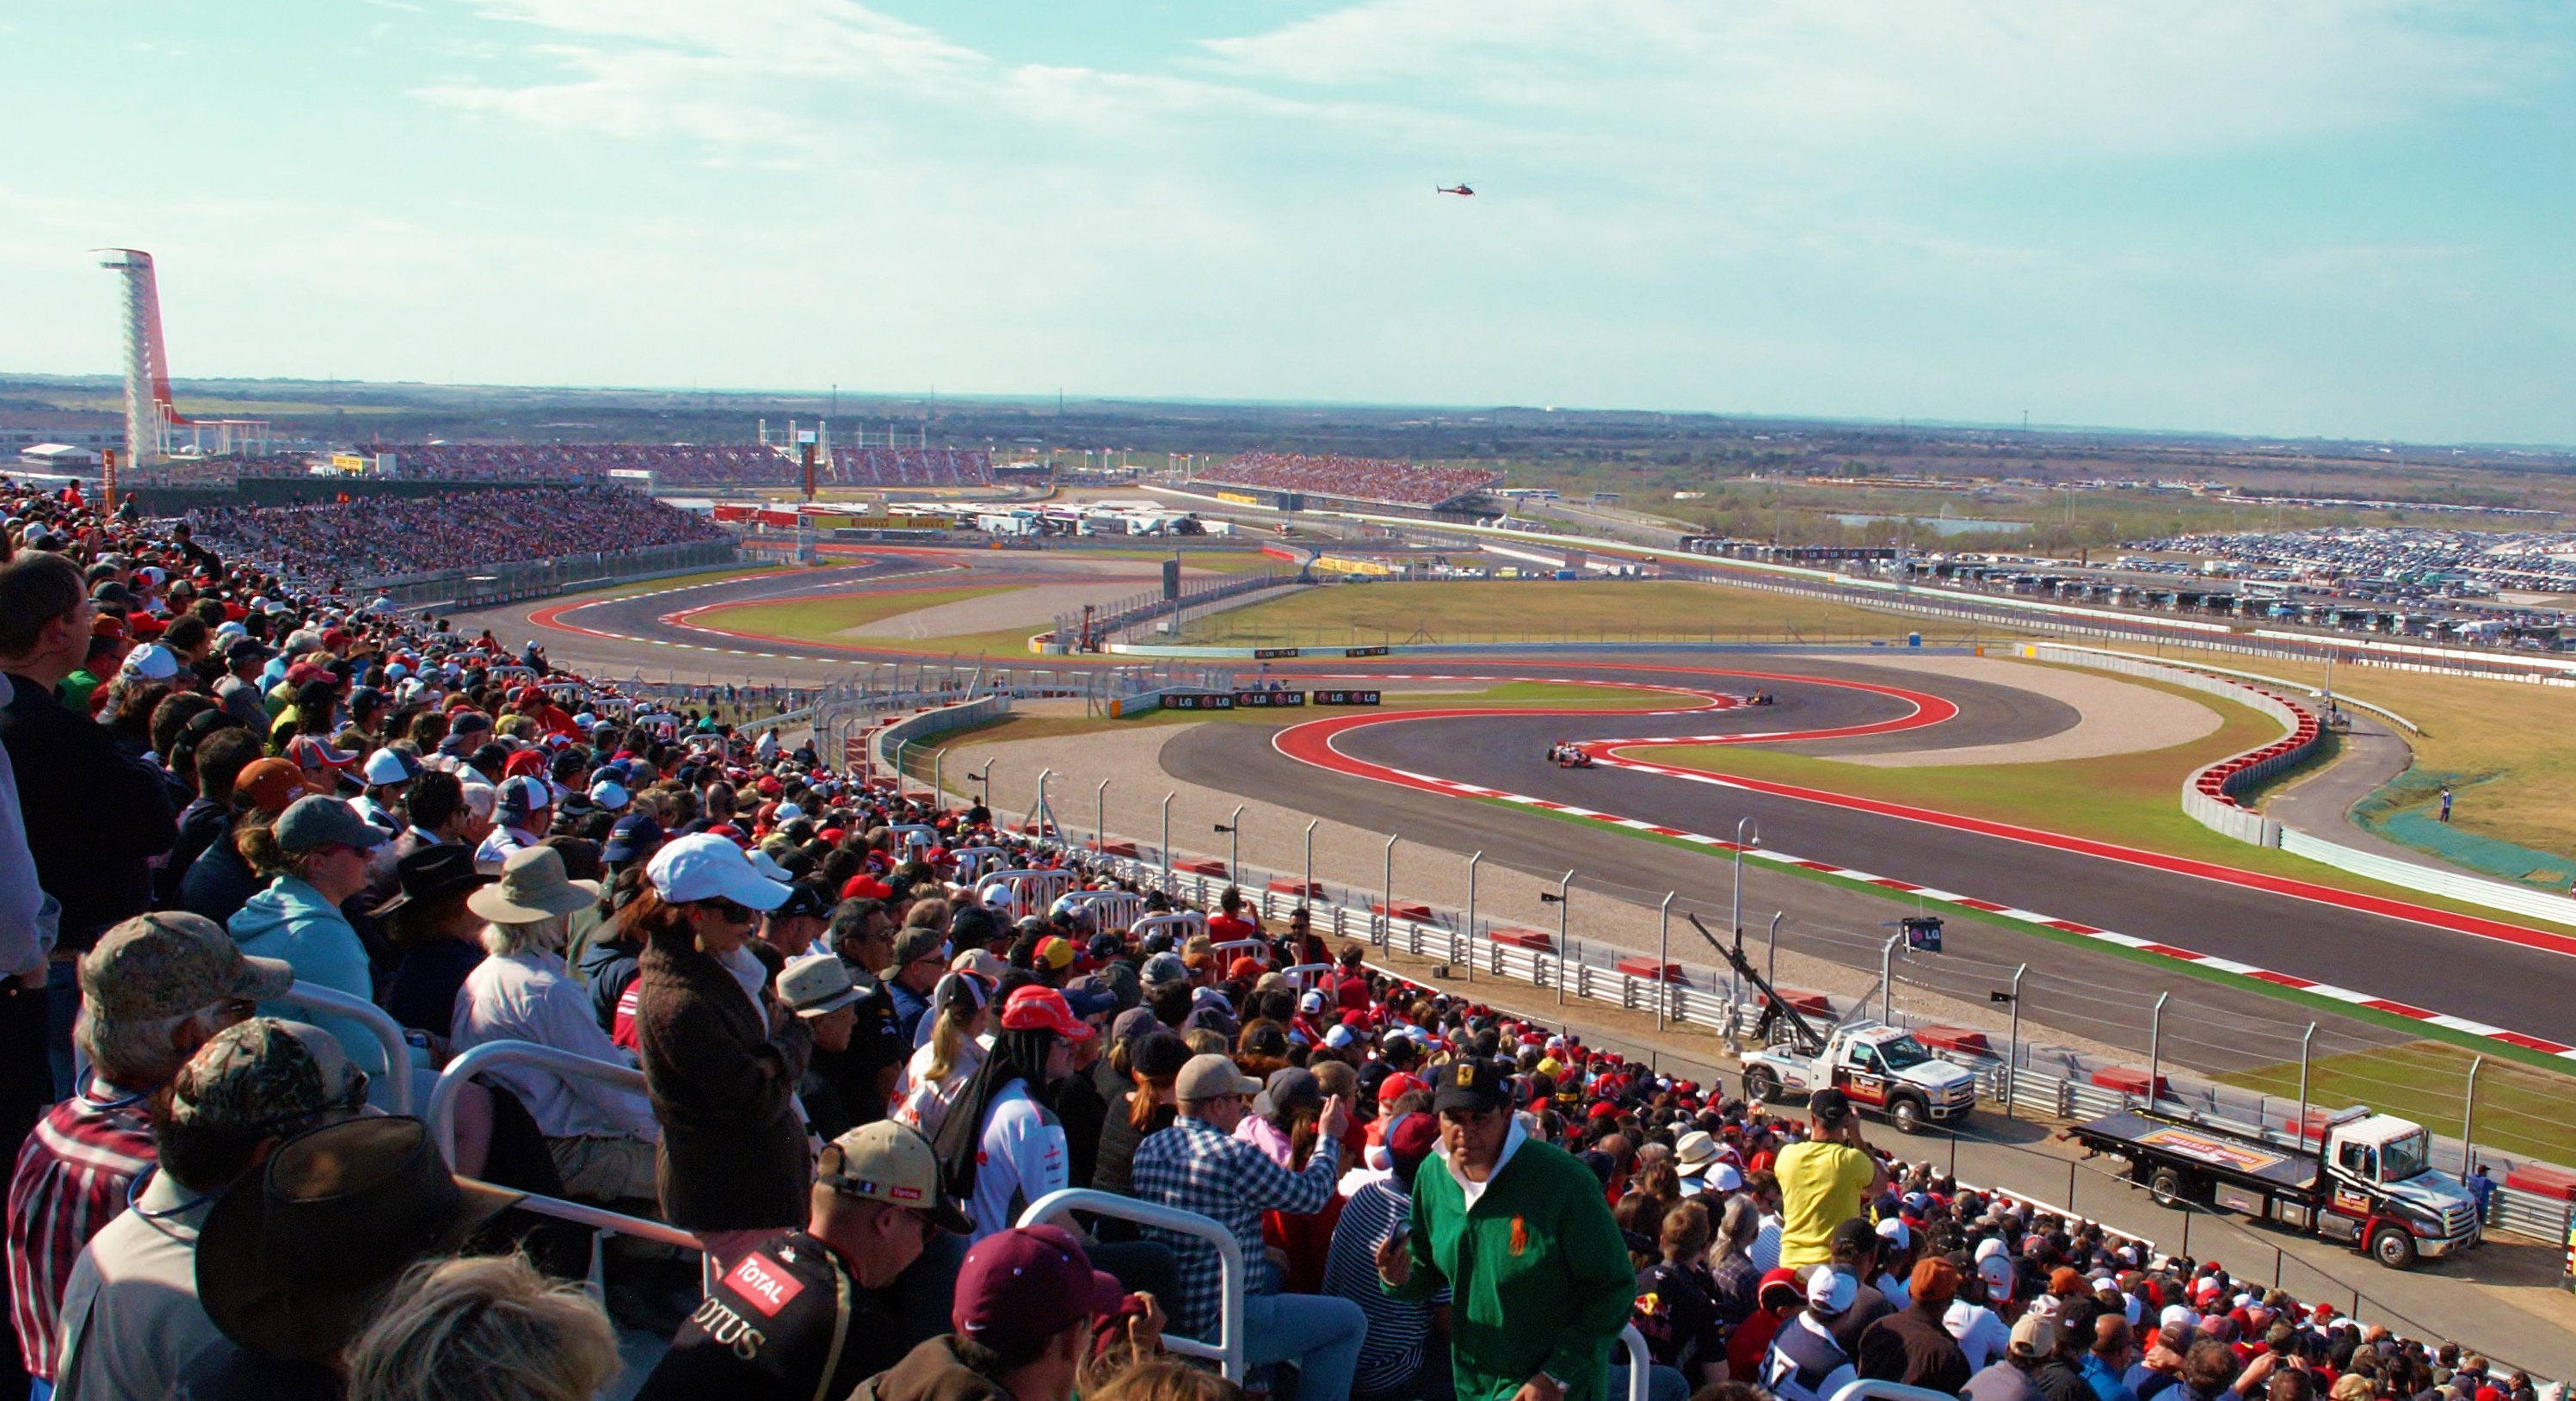 File:F1-usgp-2012-crowds-austin-texas.jpg - Wikimedia Commons